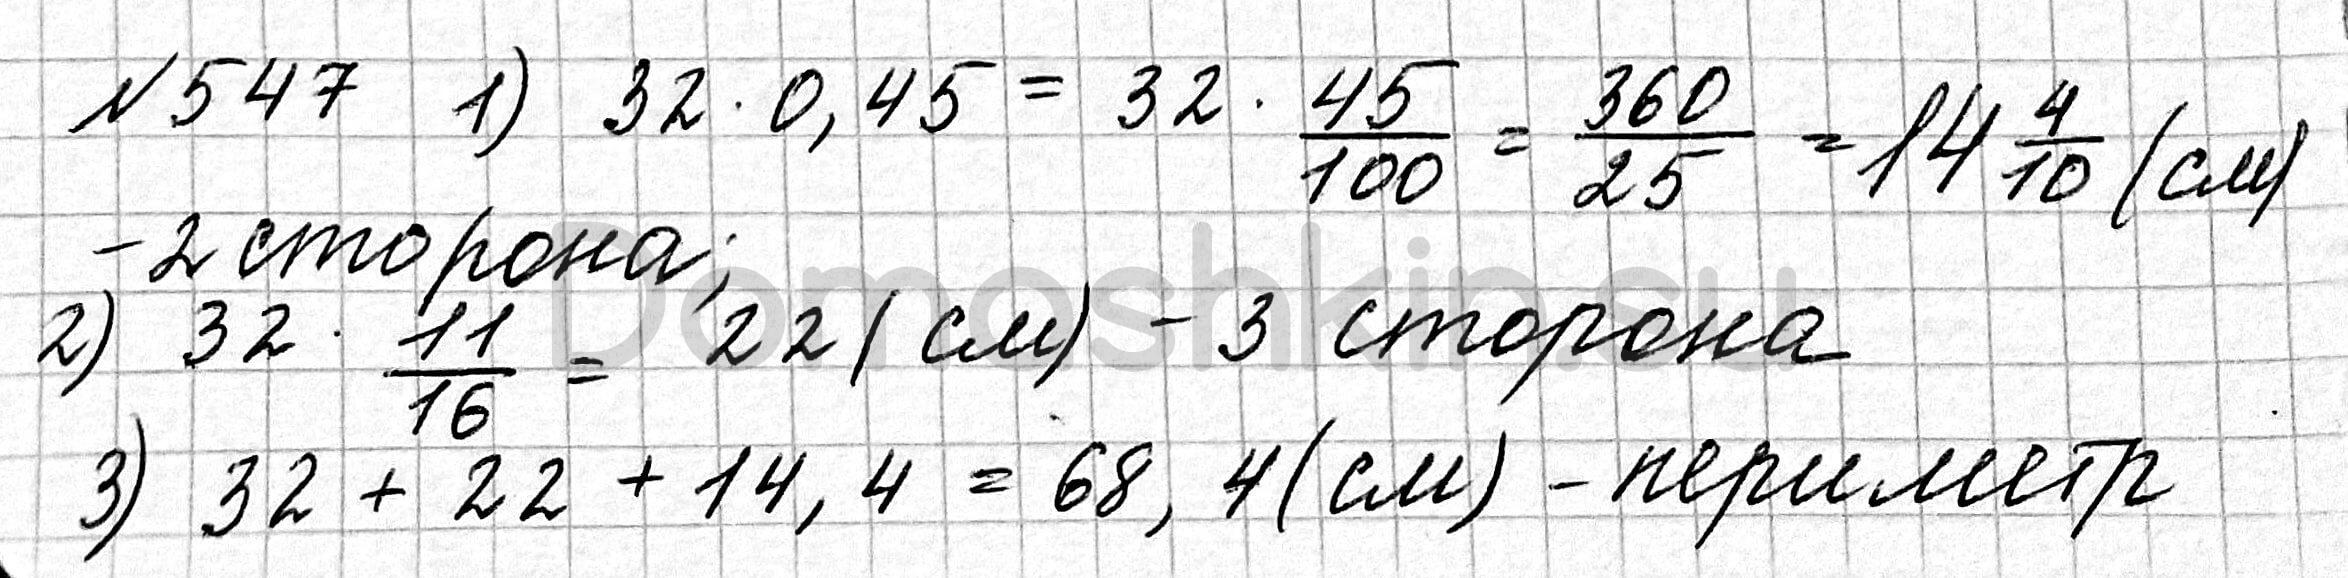 Математика 6 класс учебник Мерзляк номер 547 решение